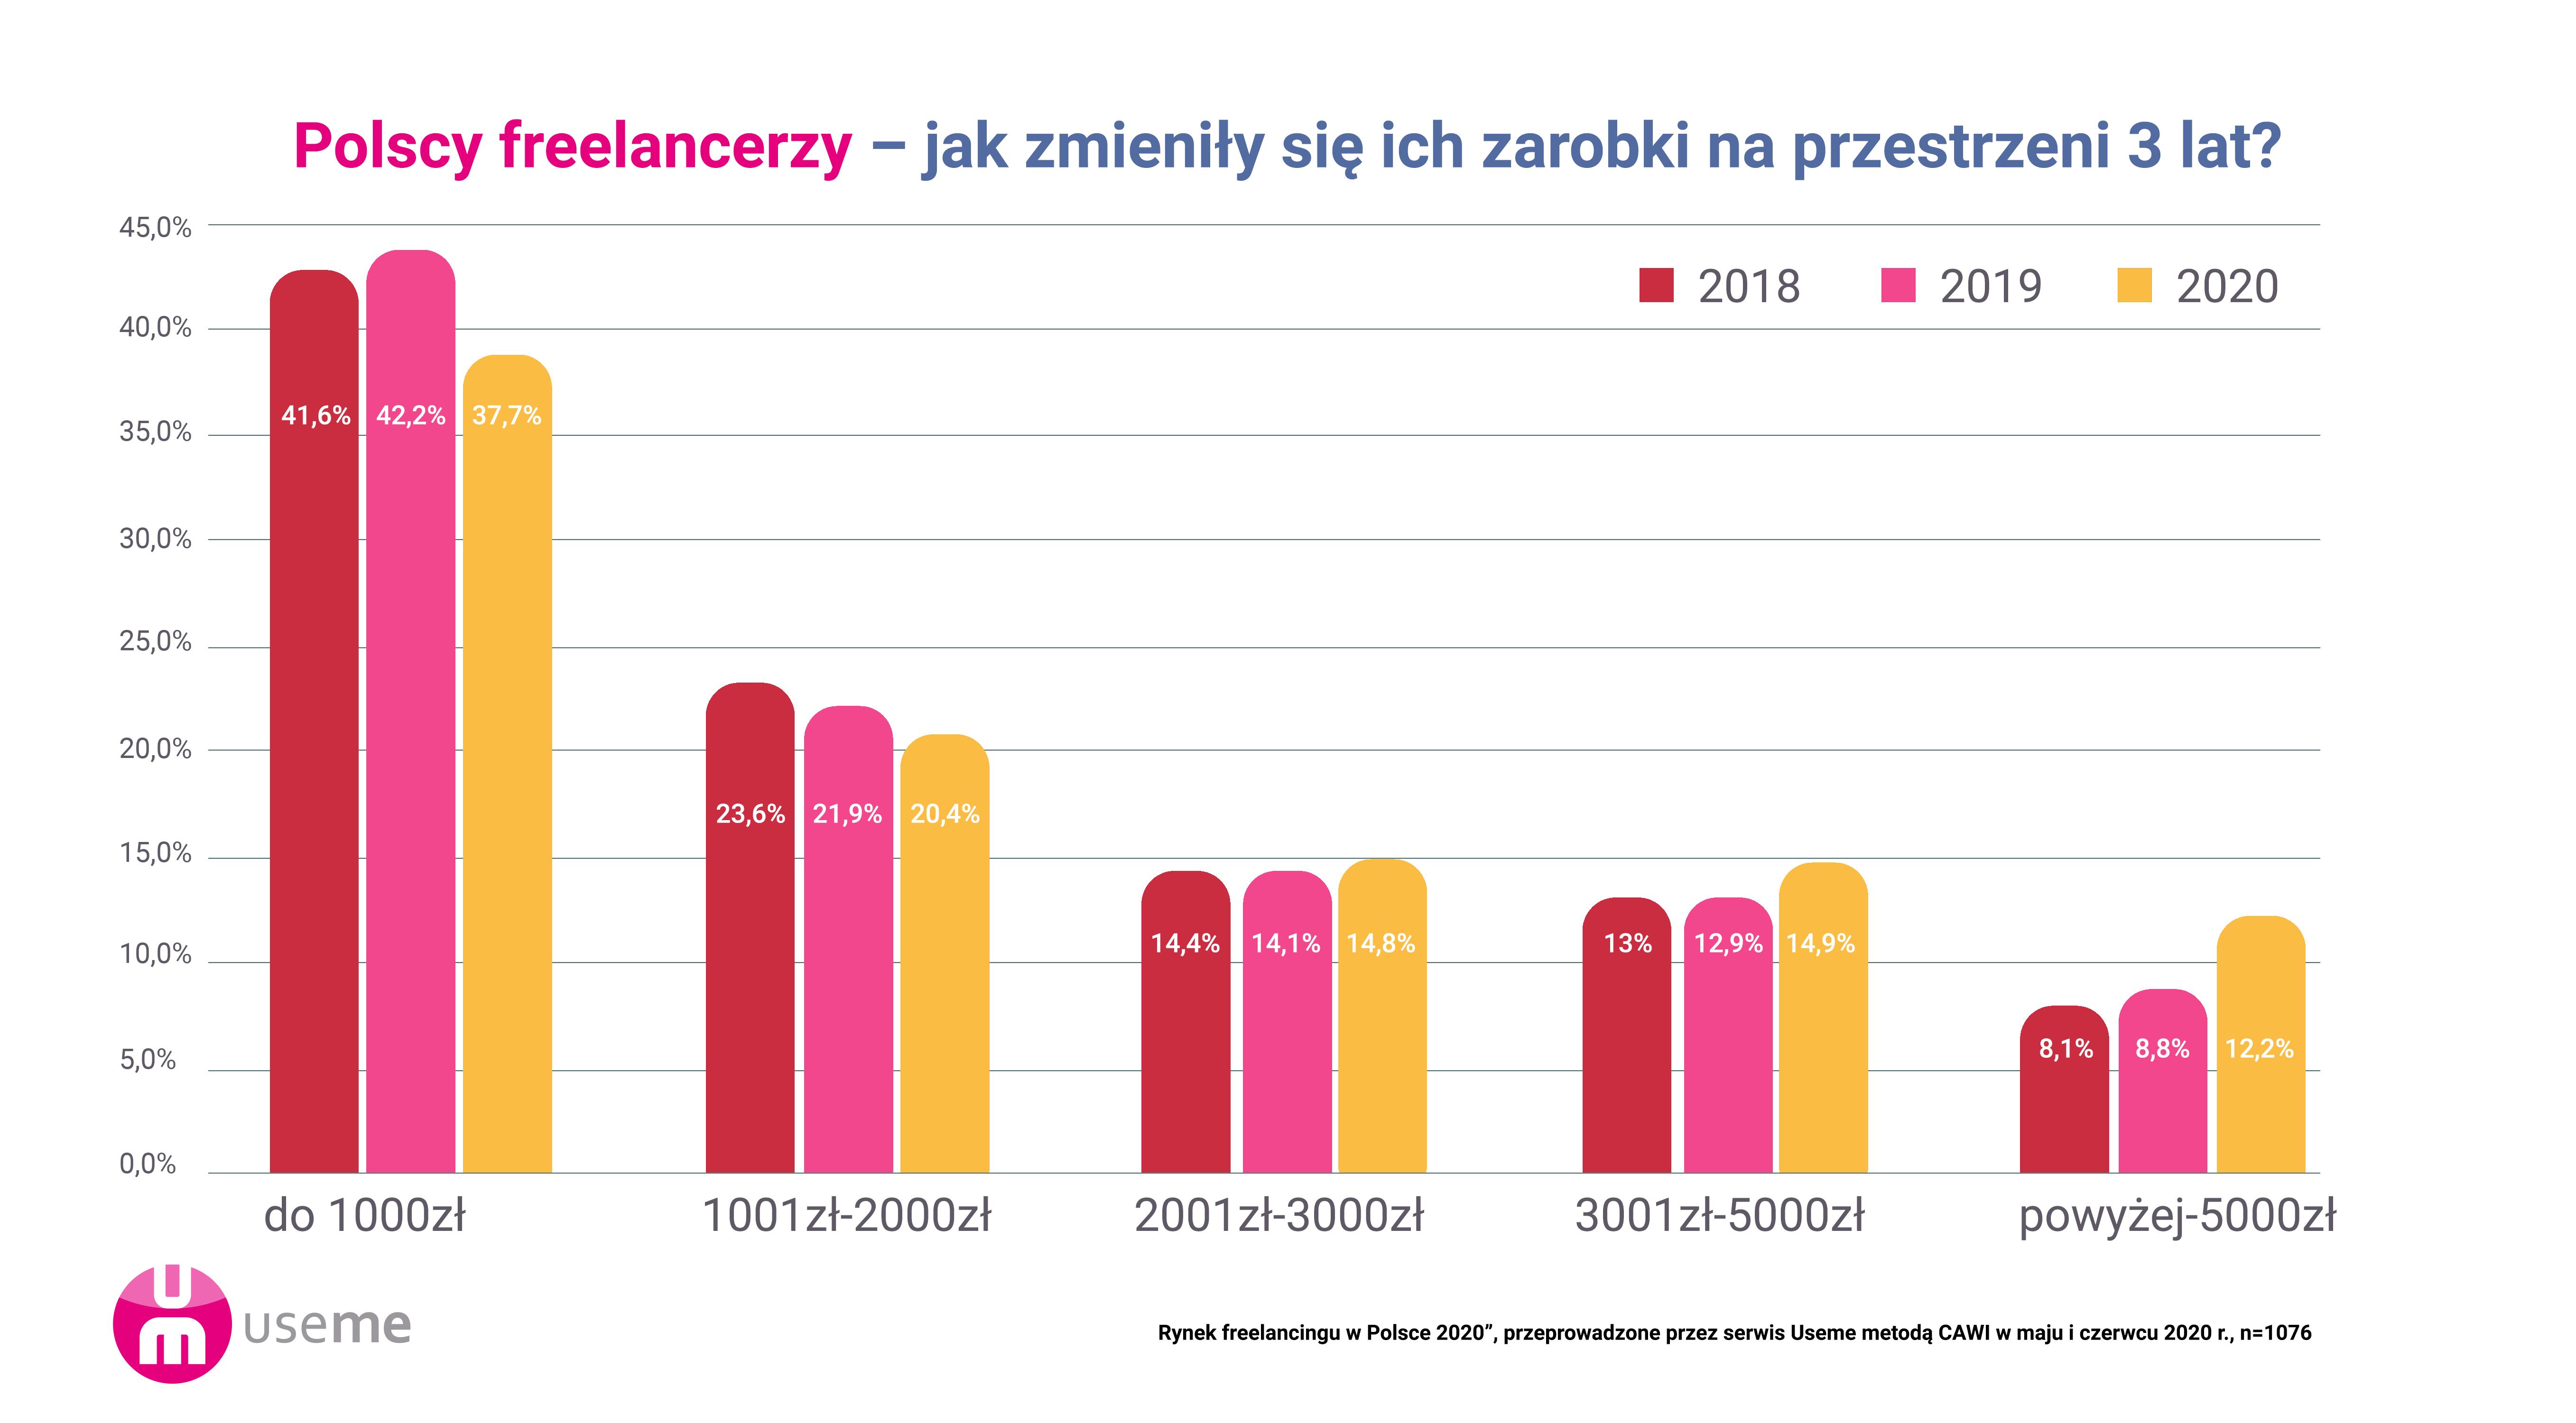 https://useme-prod-public.s3.amazonaws.com/help-images/wykres_zarobki_3_lata.png